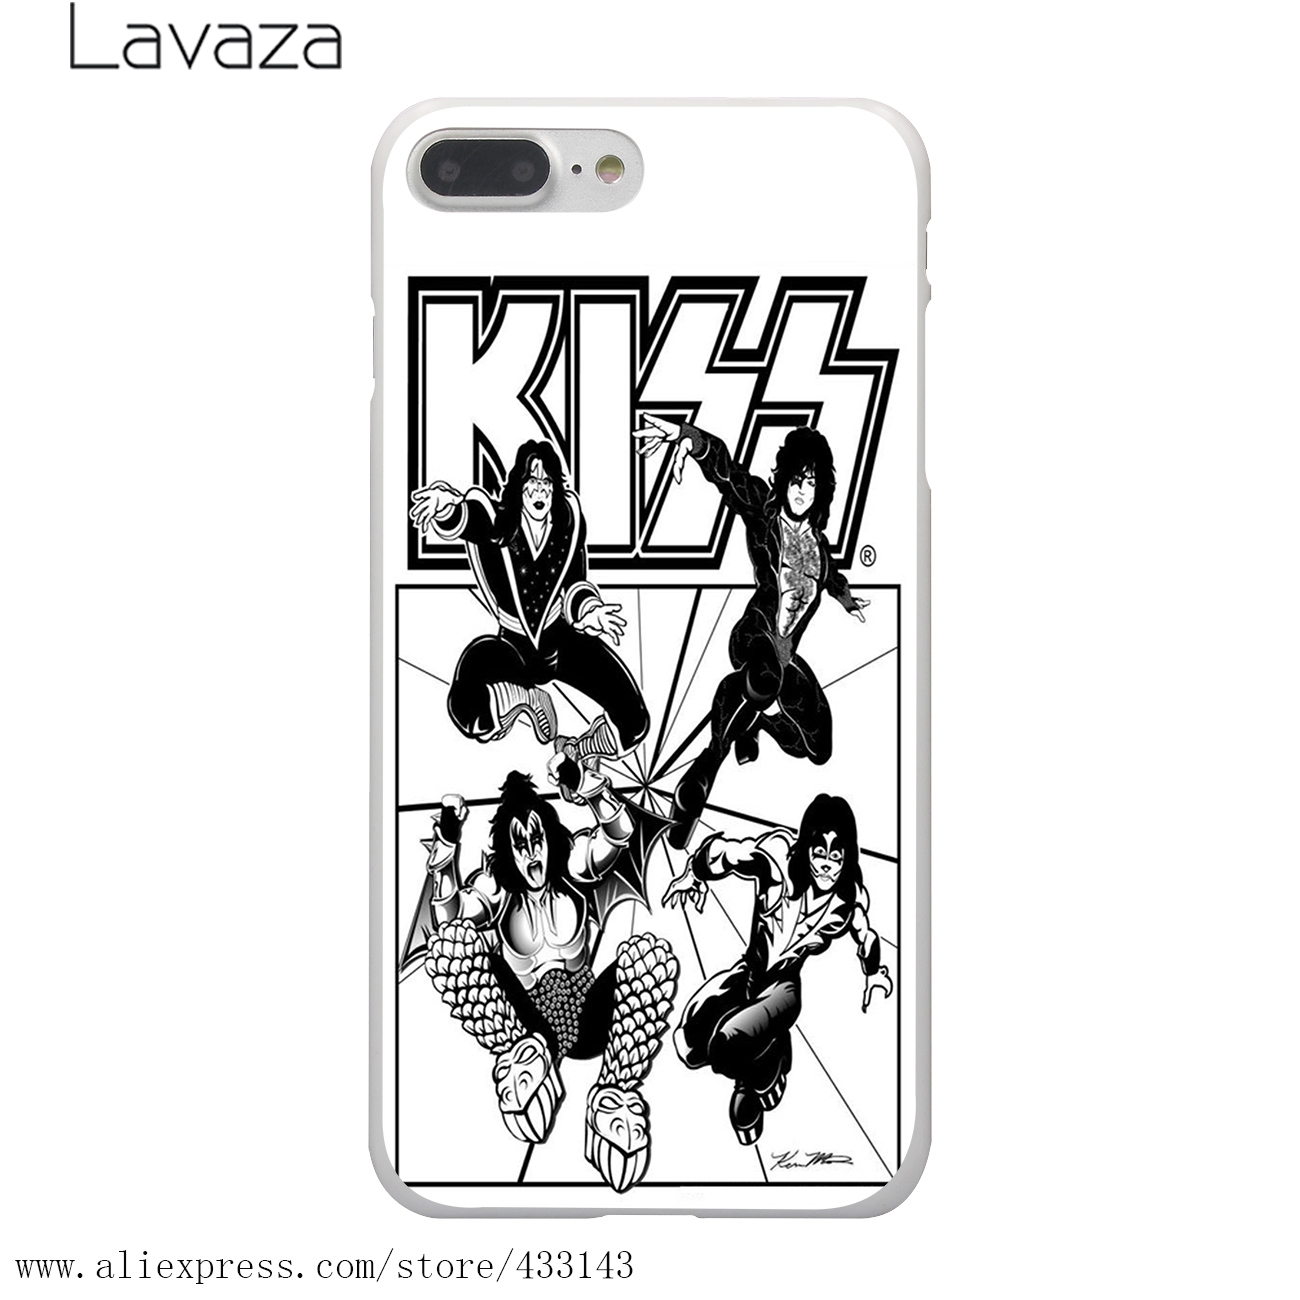 1300x1300 Lavaza Gene Simmons Kiss Band Hard White Coque Shell Phone Case